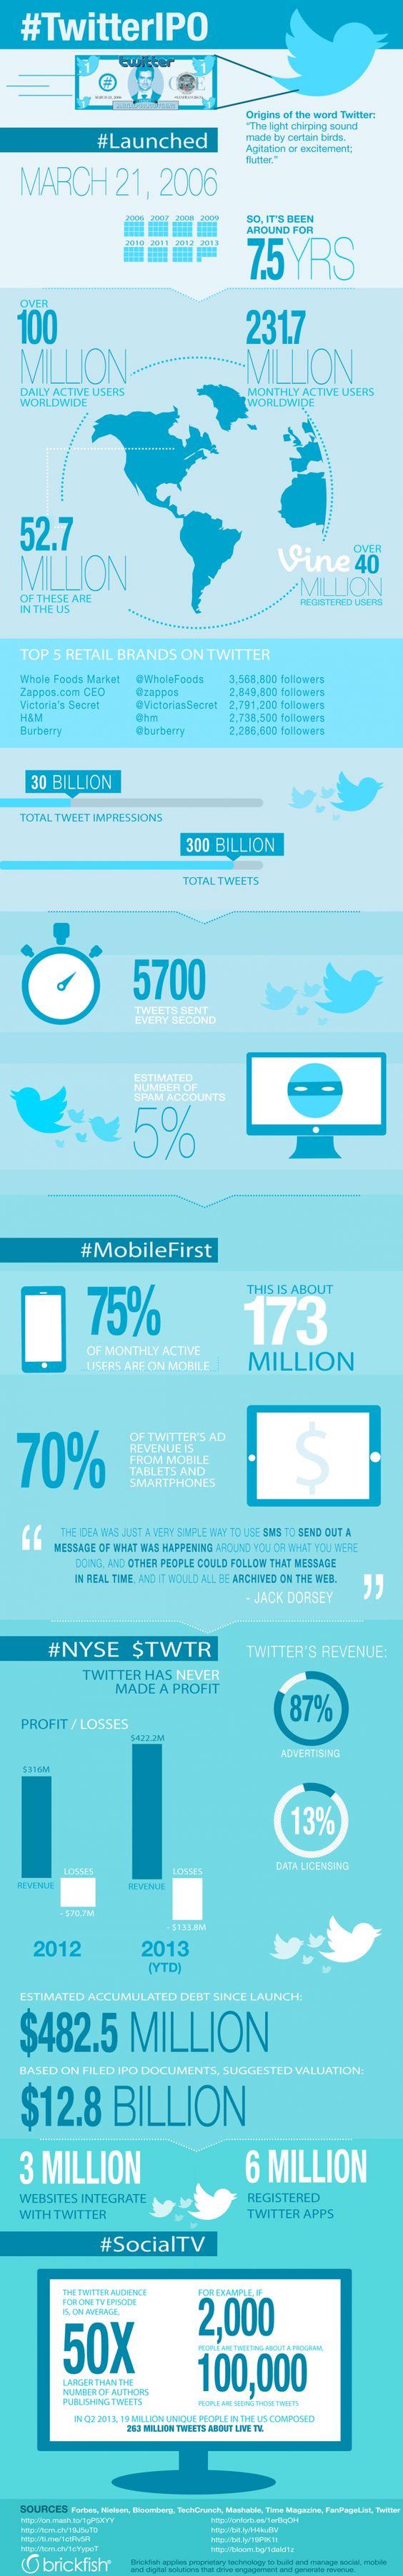 Amazing Twitter Statistics [INFOGRAPHIC]